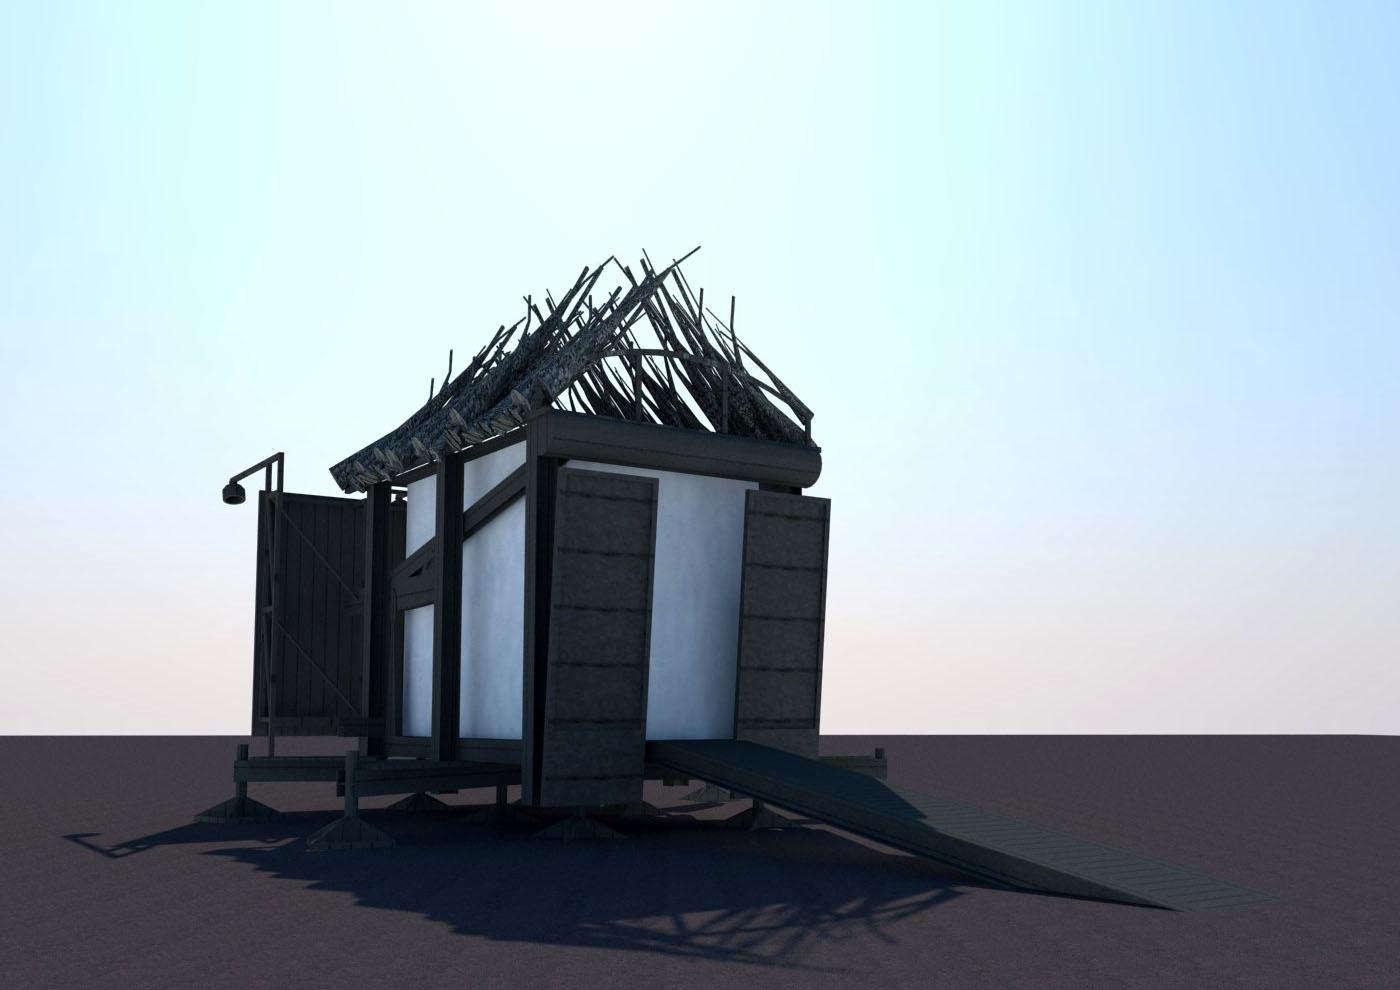 essay on architecture primitive hut